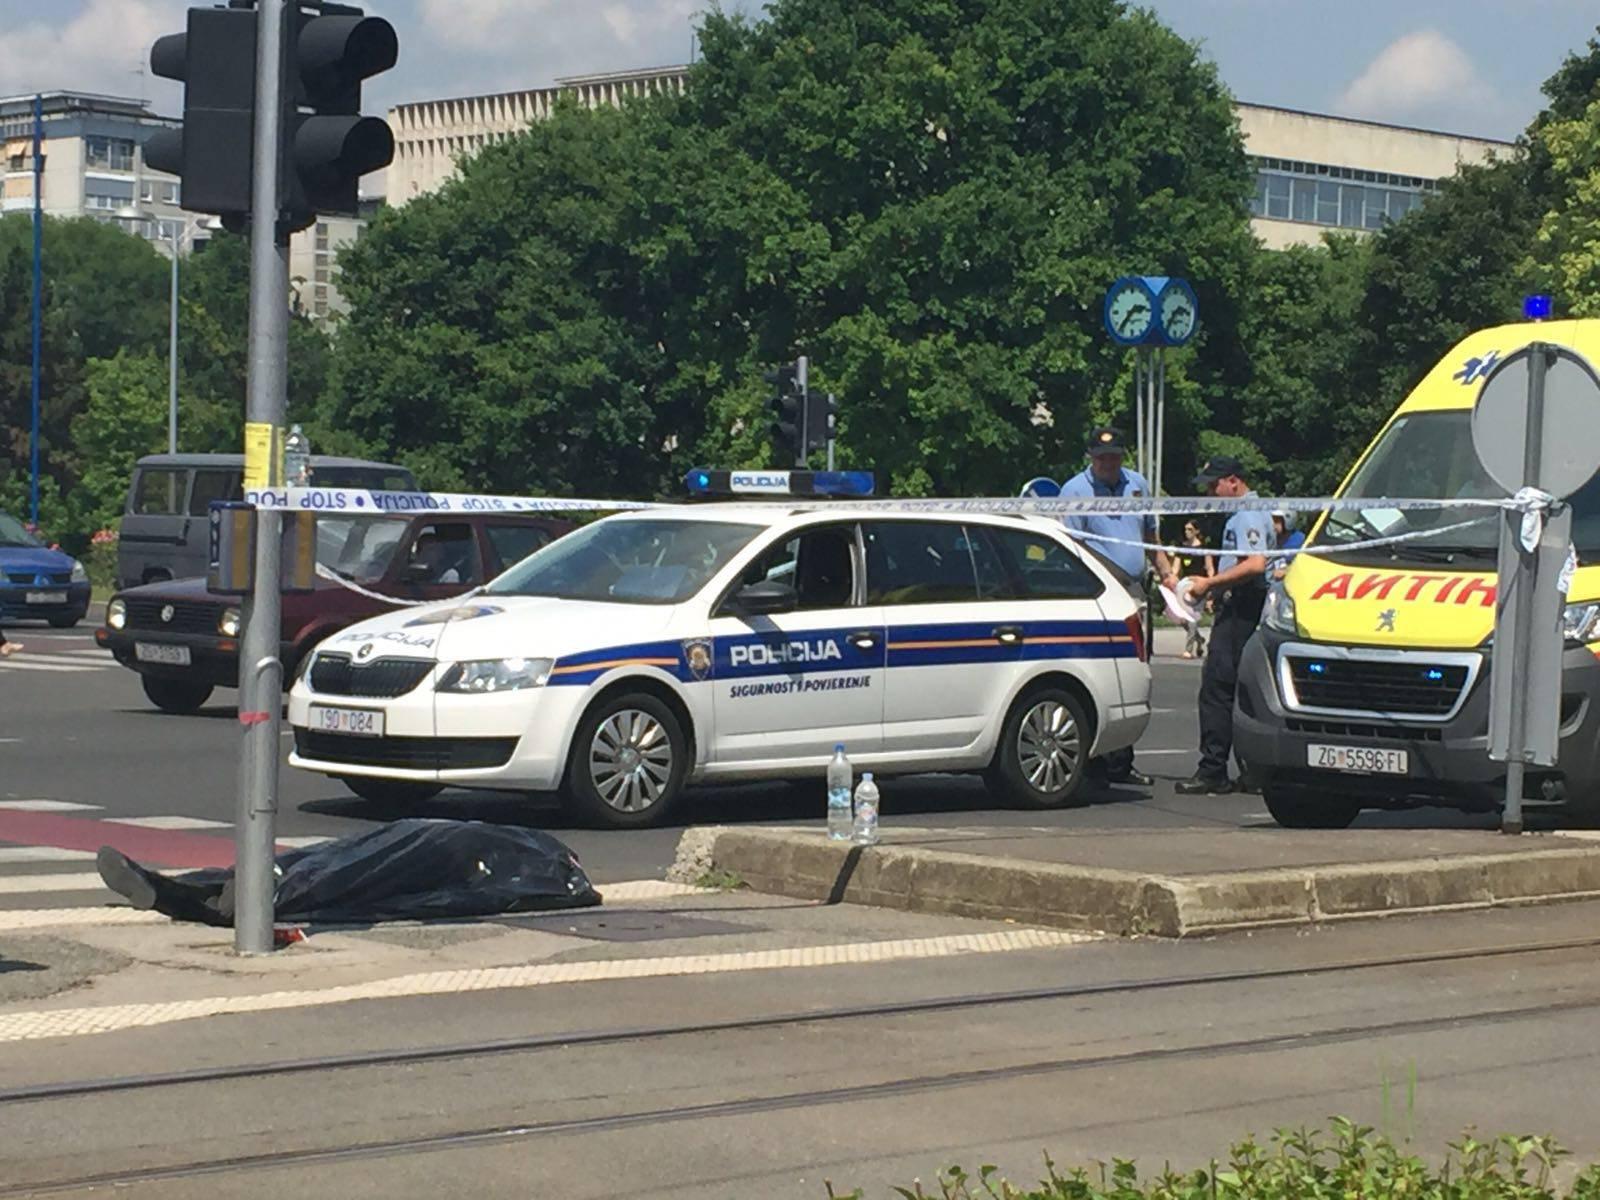 Prva žrtva vrućine u Zagrebu: Muškarac umro prelazeći cestu